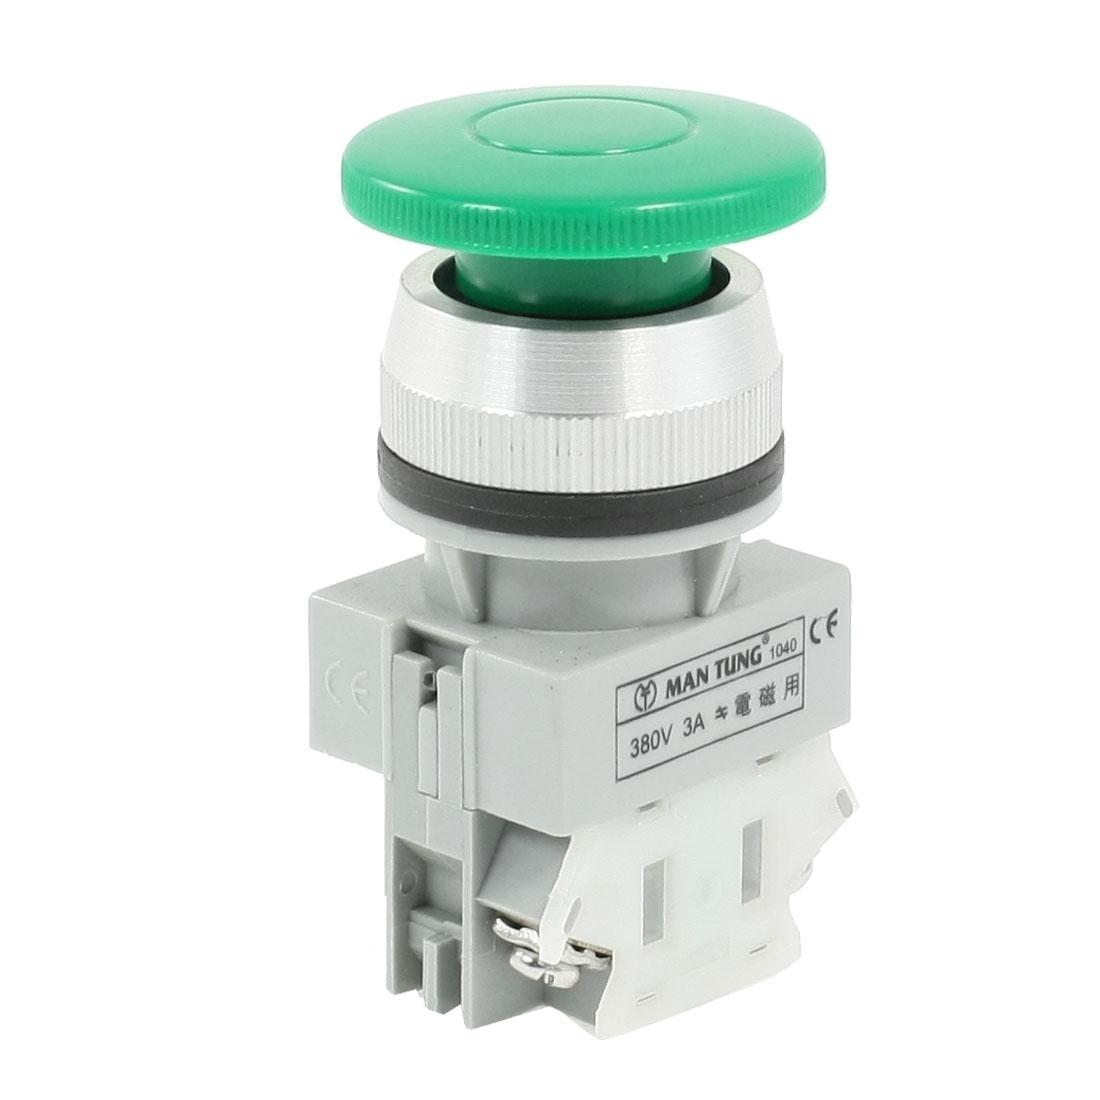 Green Mushroom Head 2-Terminals Momentary Push Botton Switch AC 380V 3A